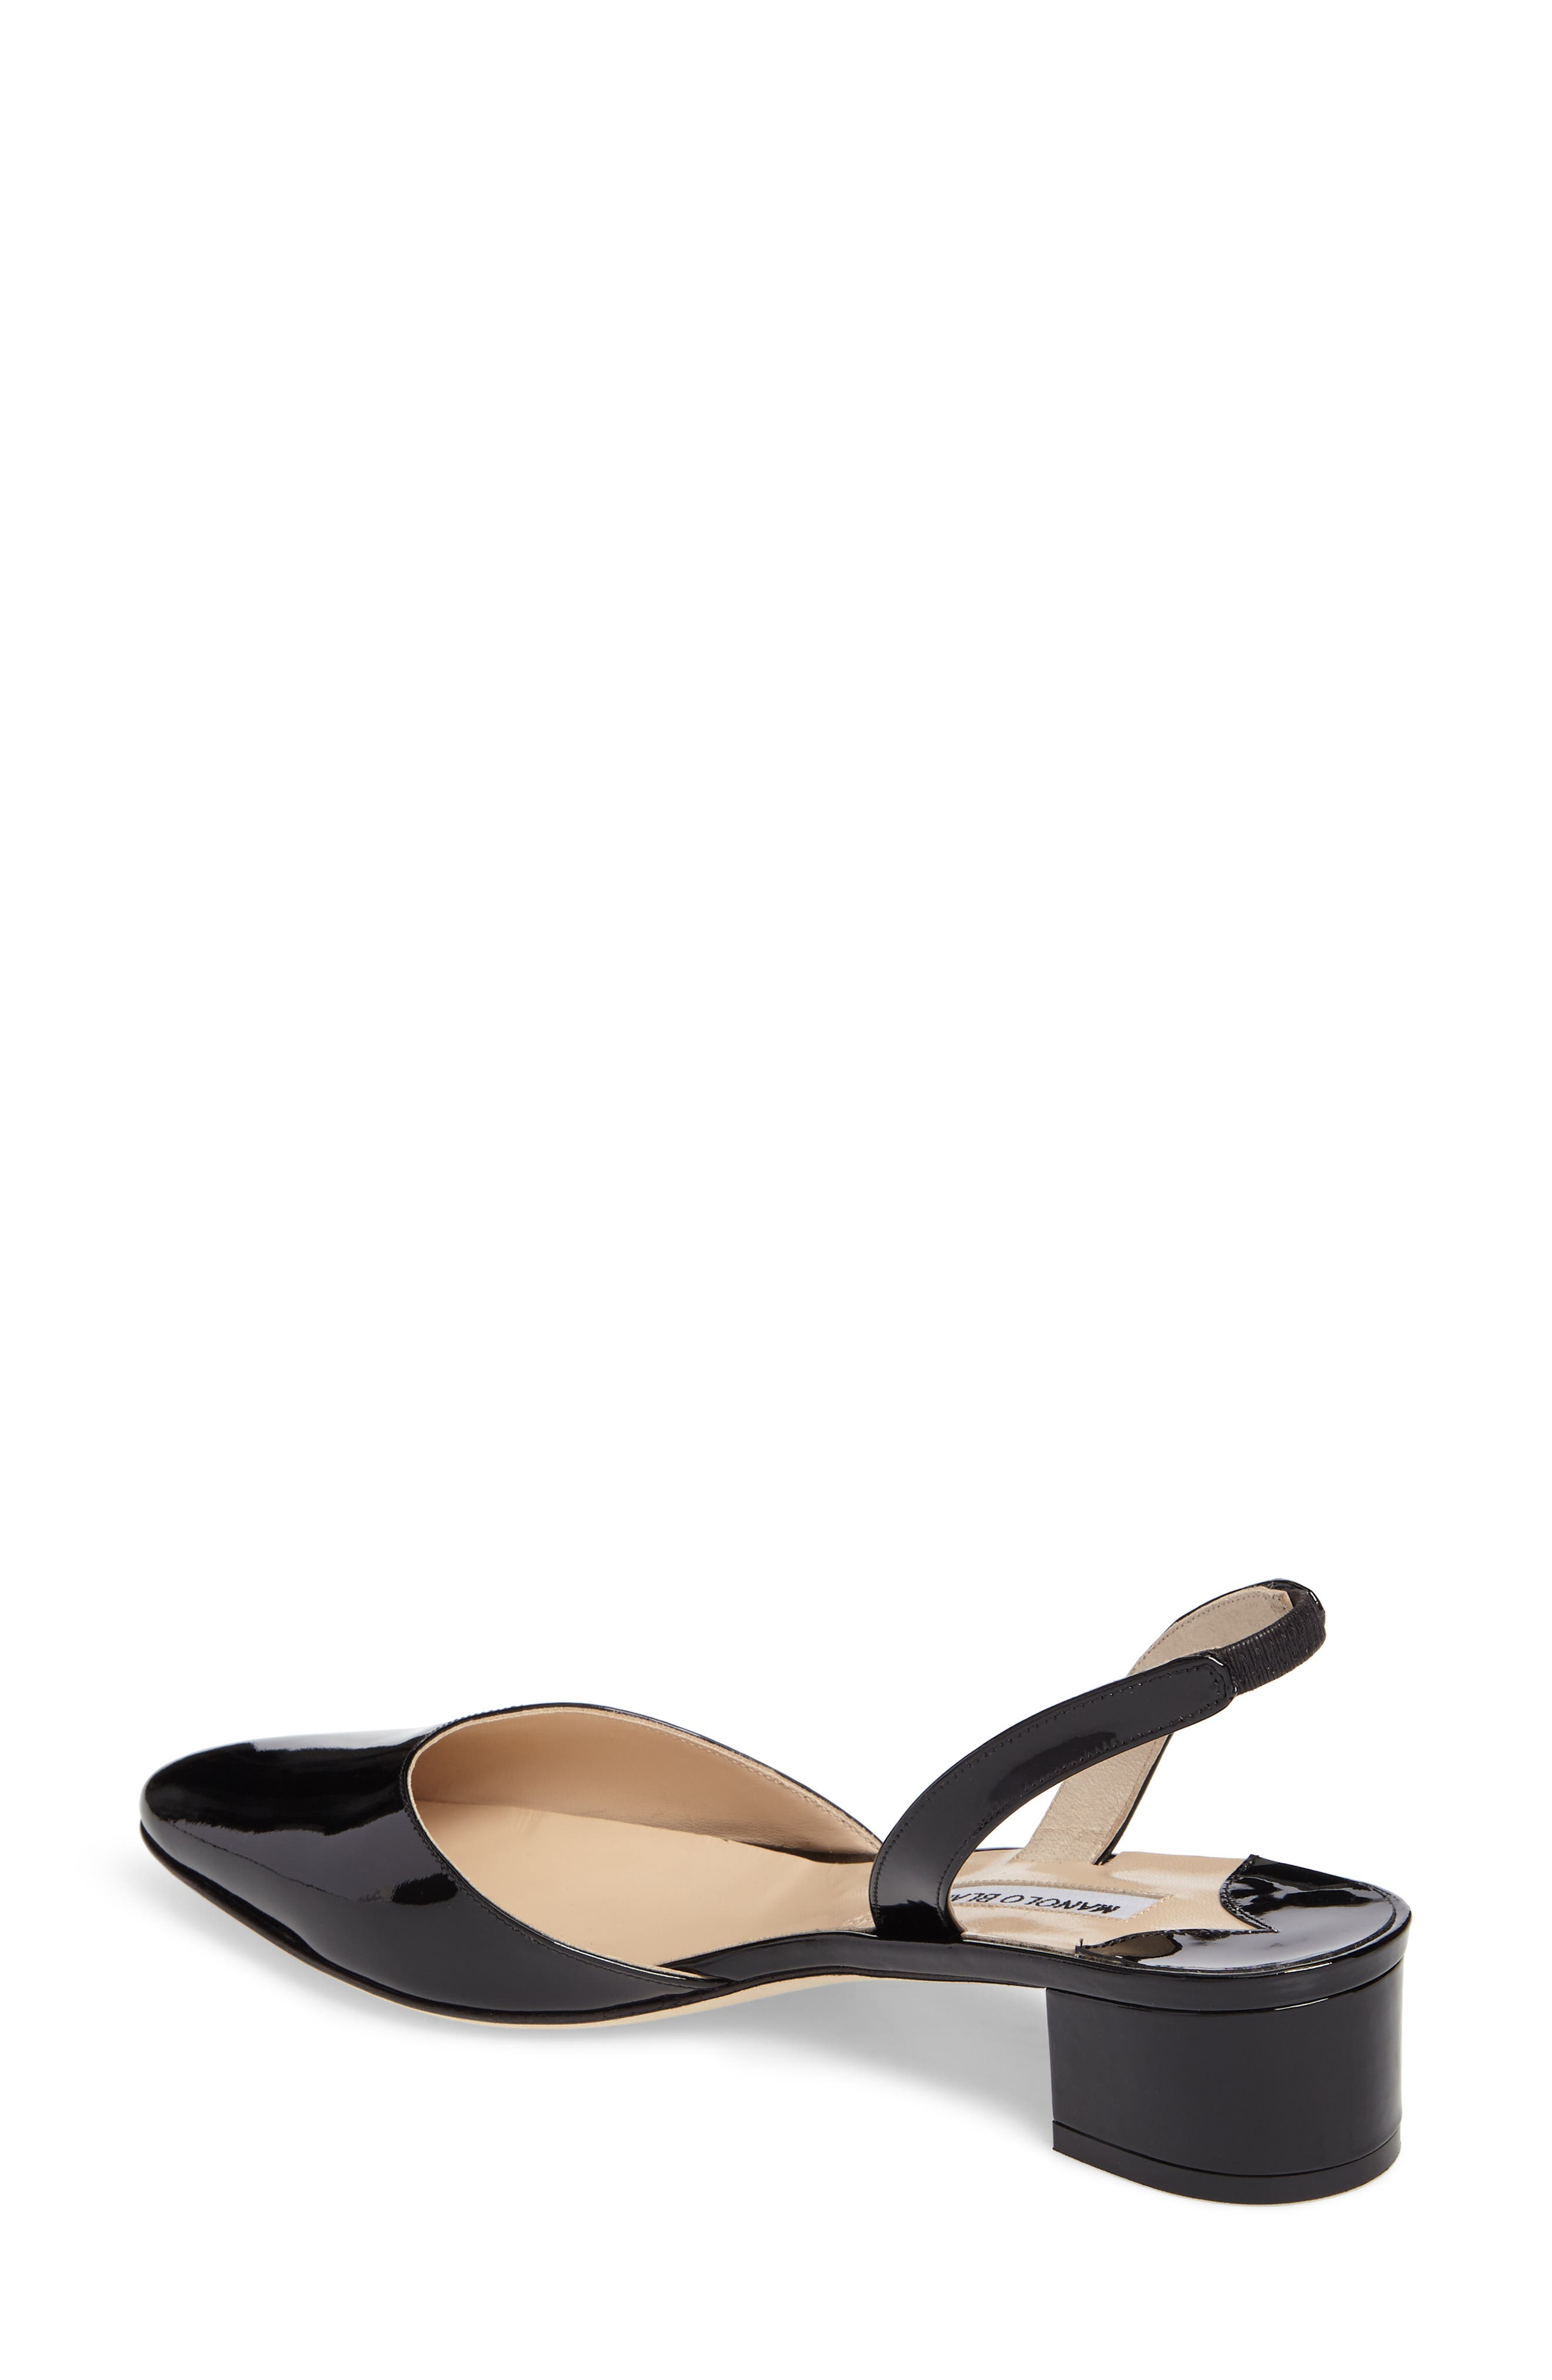 Alternate Image 2  - Manolo Blahnik Aspro Block Heel Pump (Women)